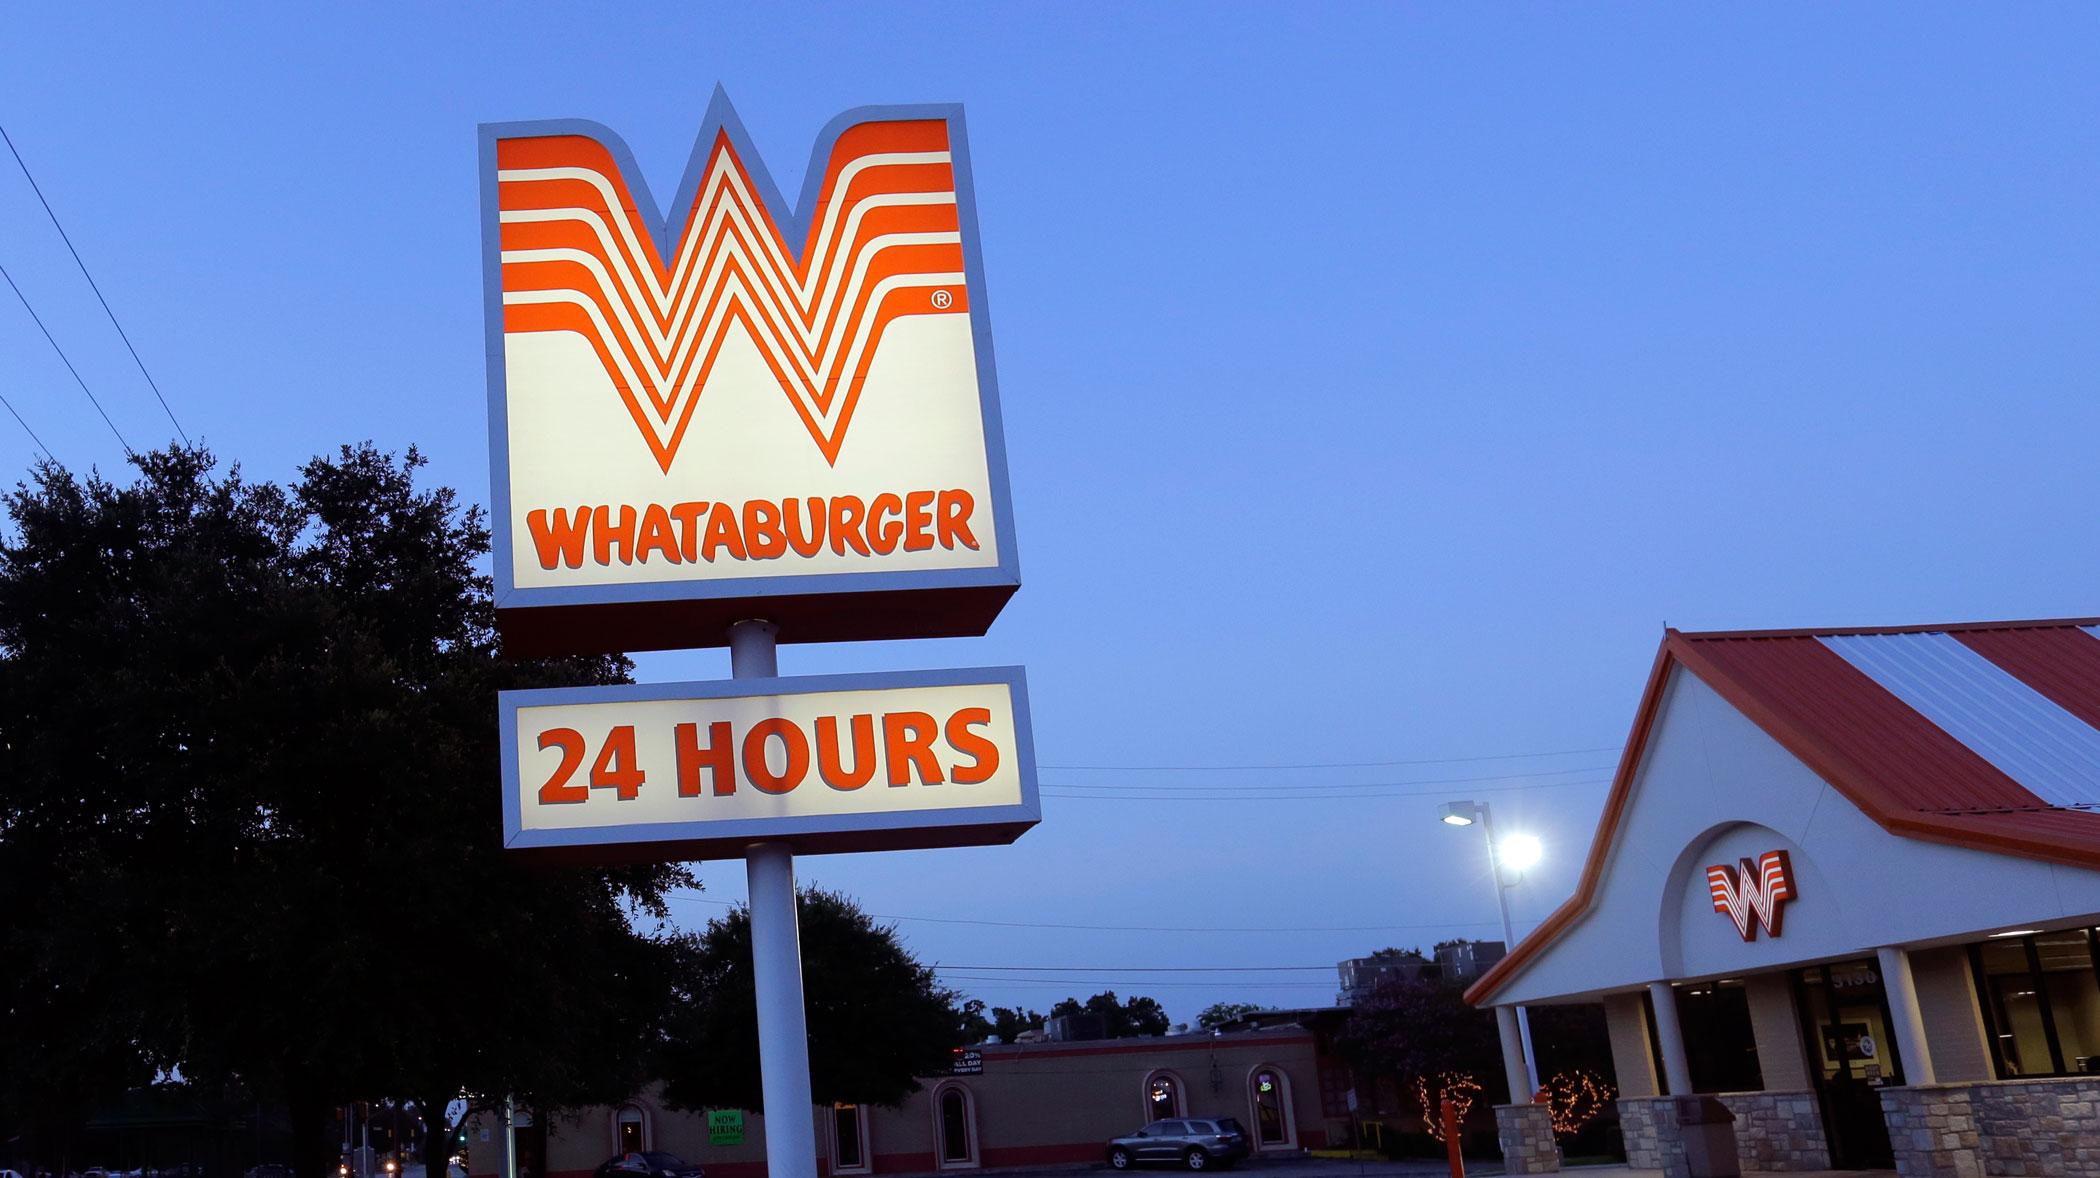 Whataburger on July 9, 2015 in San Antonio.